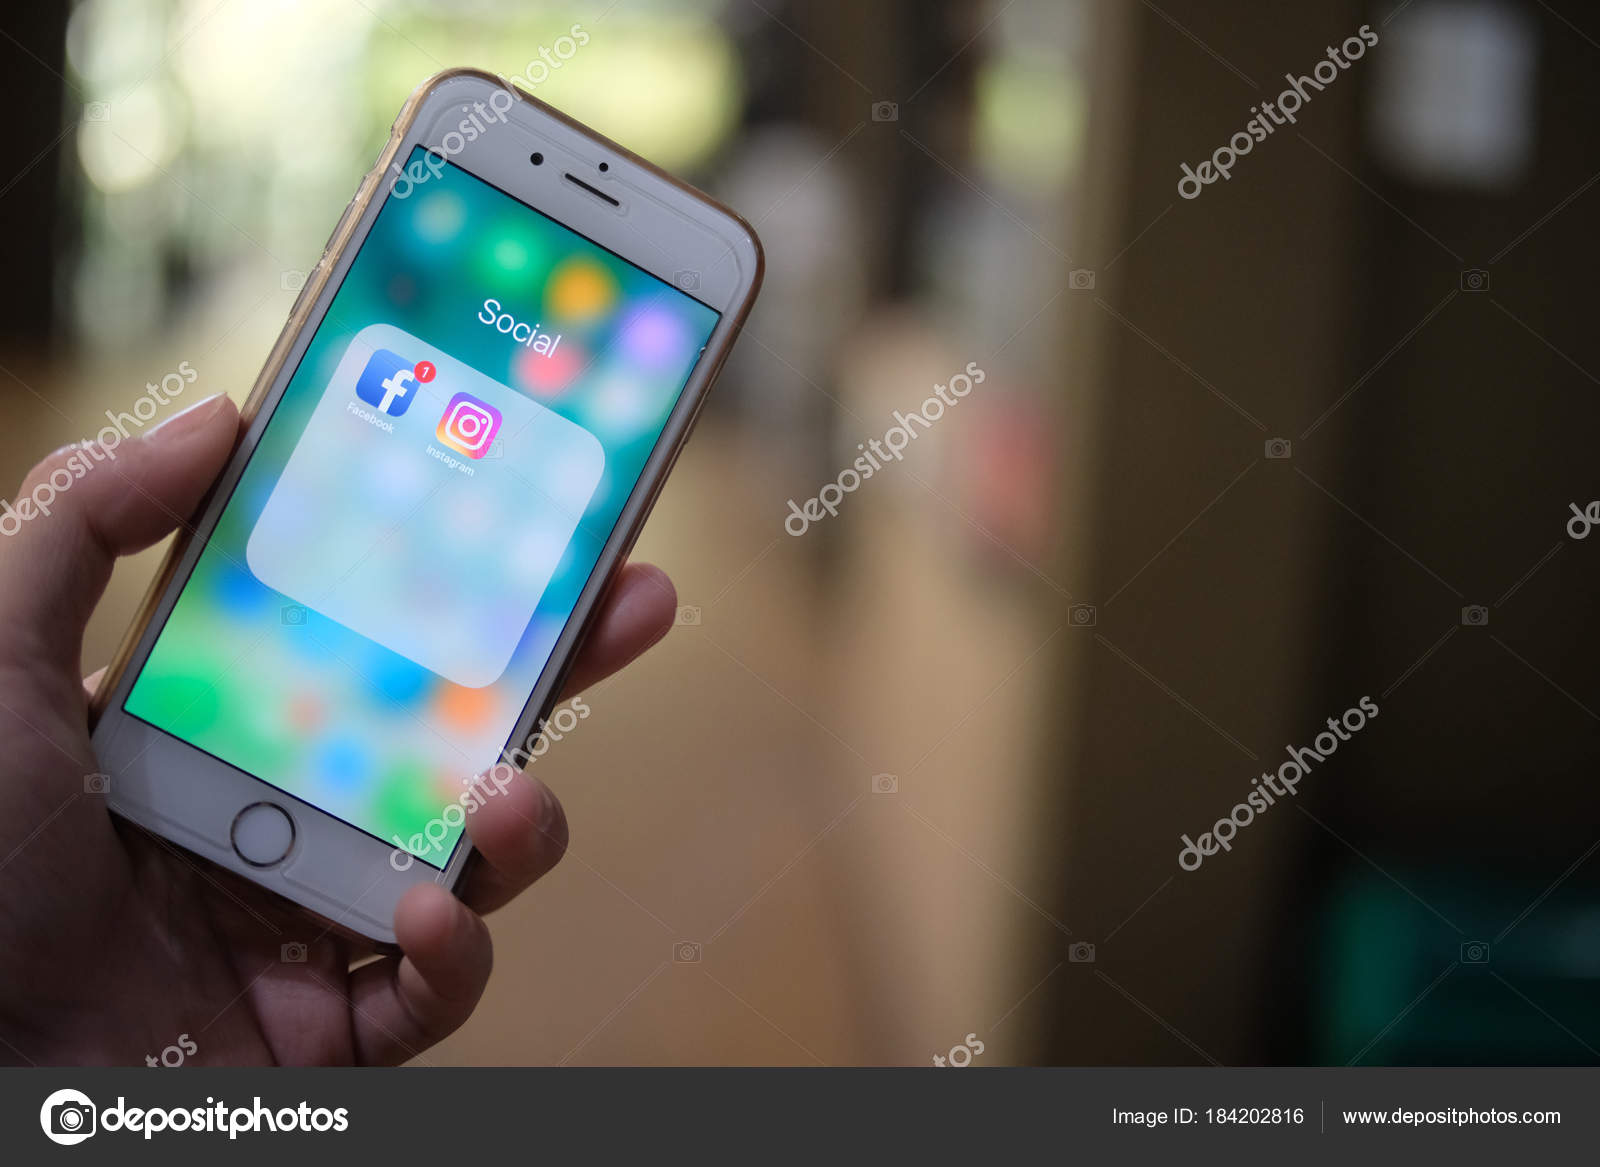 Chiang Mai Thailandia 17 Gennaio 2017 Uomo In Possesso Di Iphone